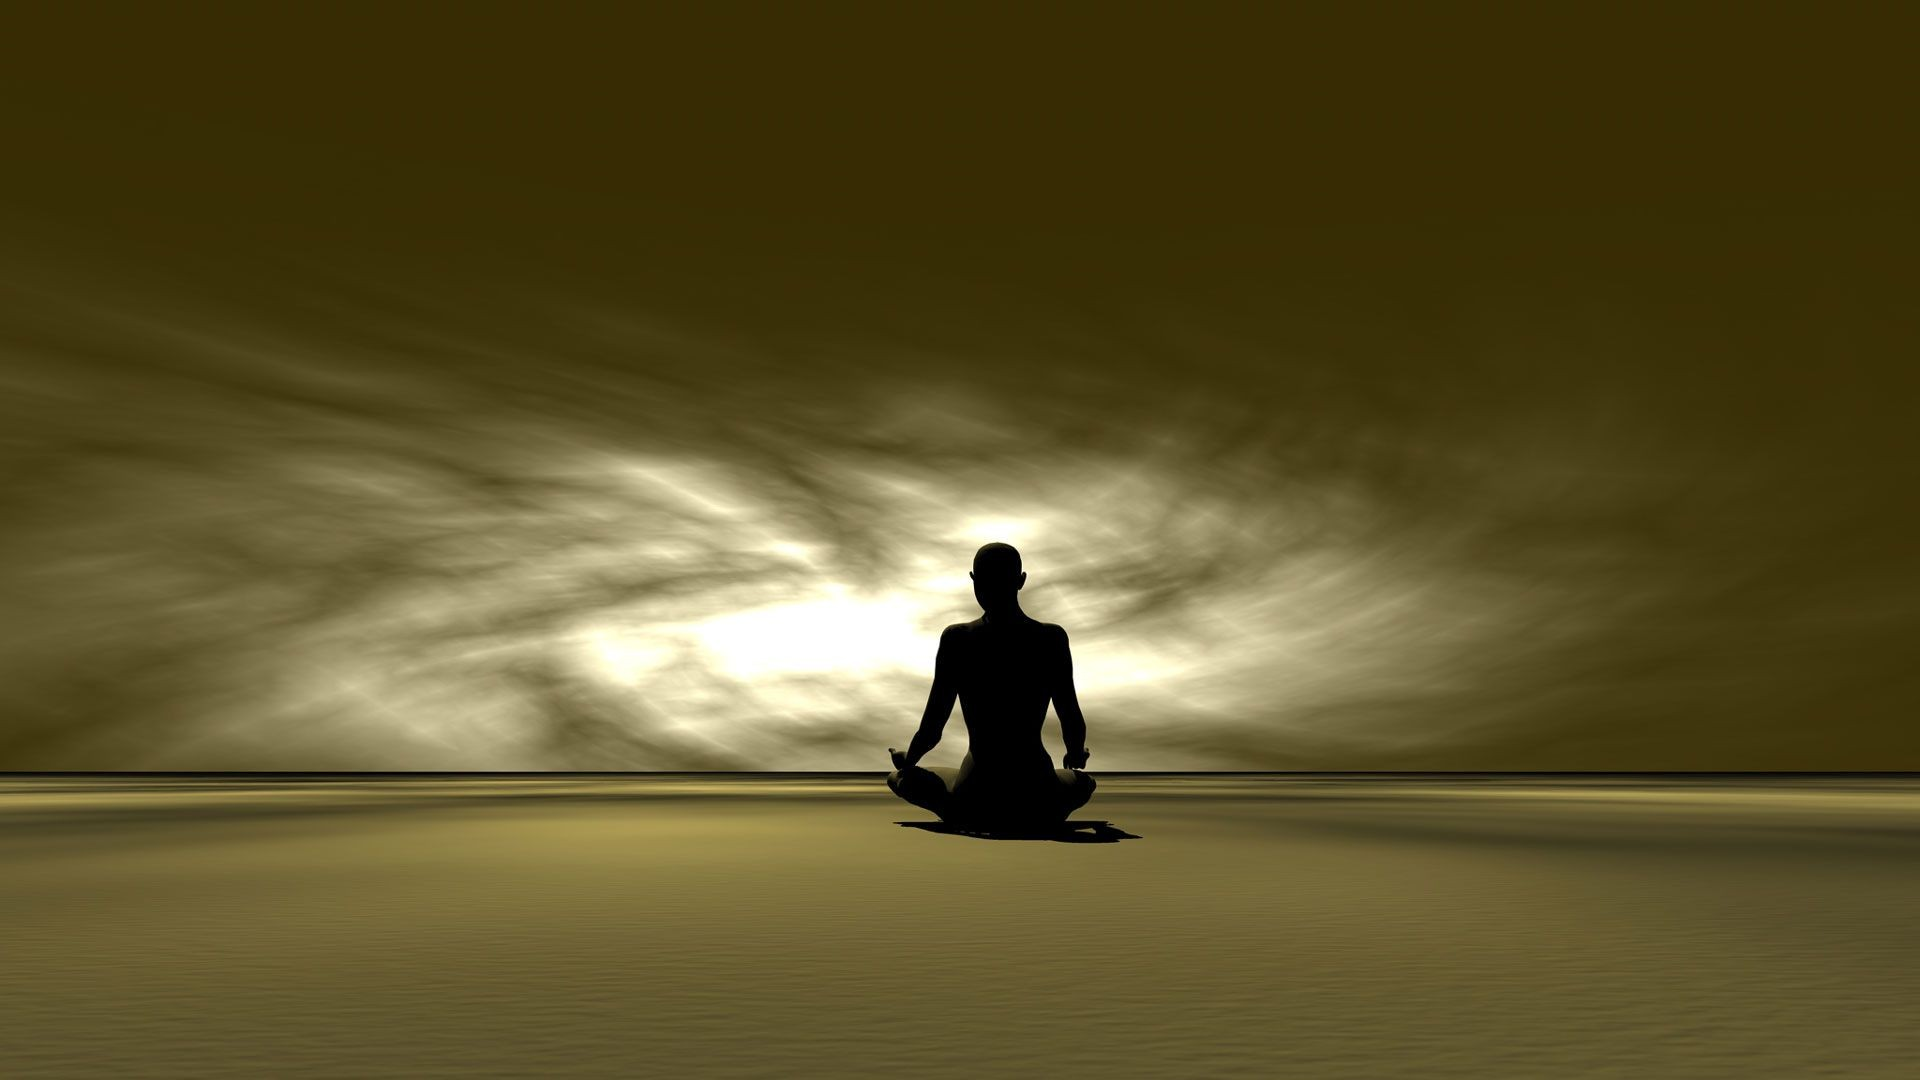 Spiritual Quotes For Laptop Wallpaper Meditation Wallpaper 183 ① Download Free Beautiful Wallpapers